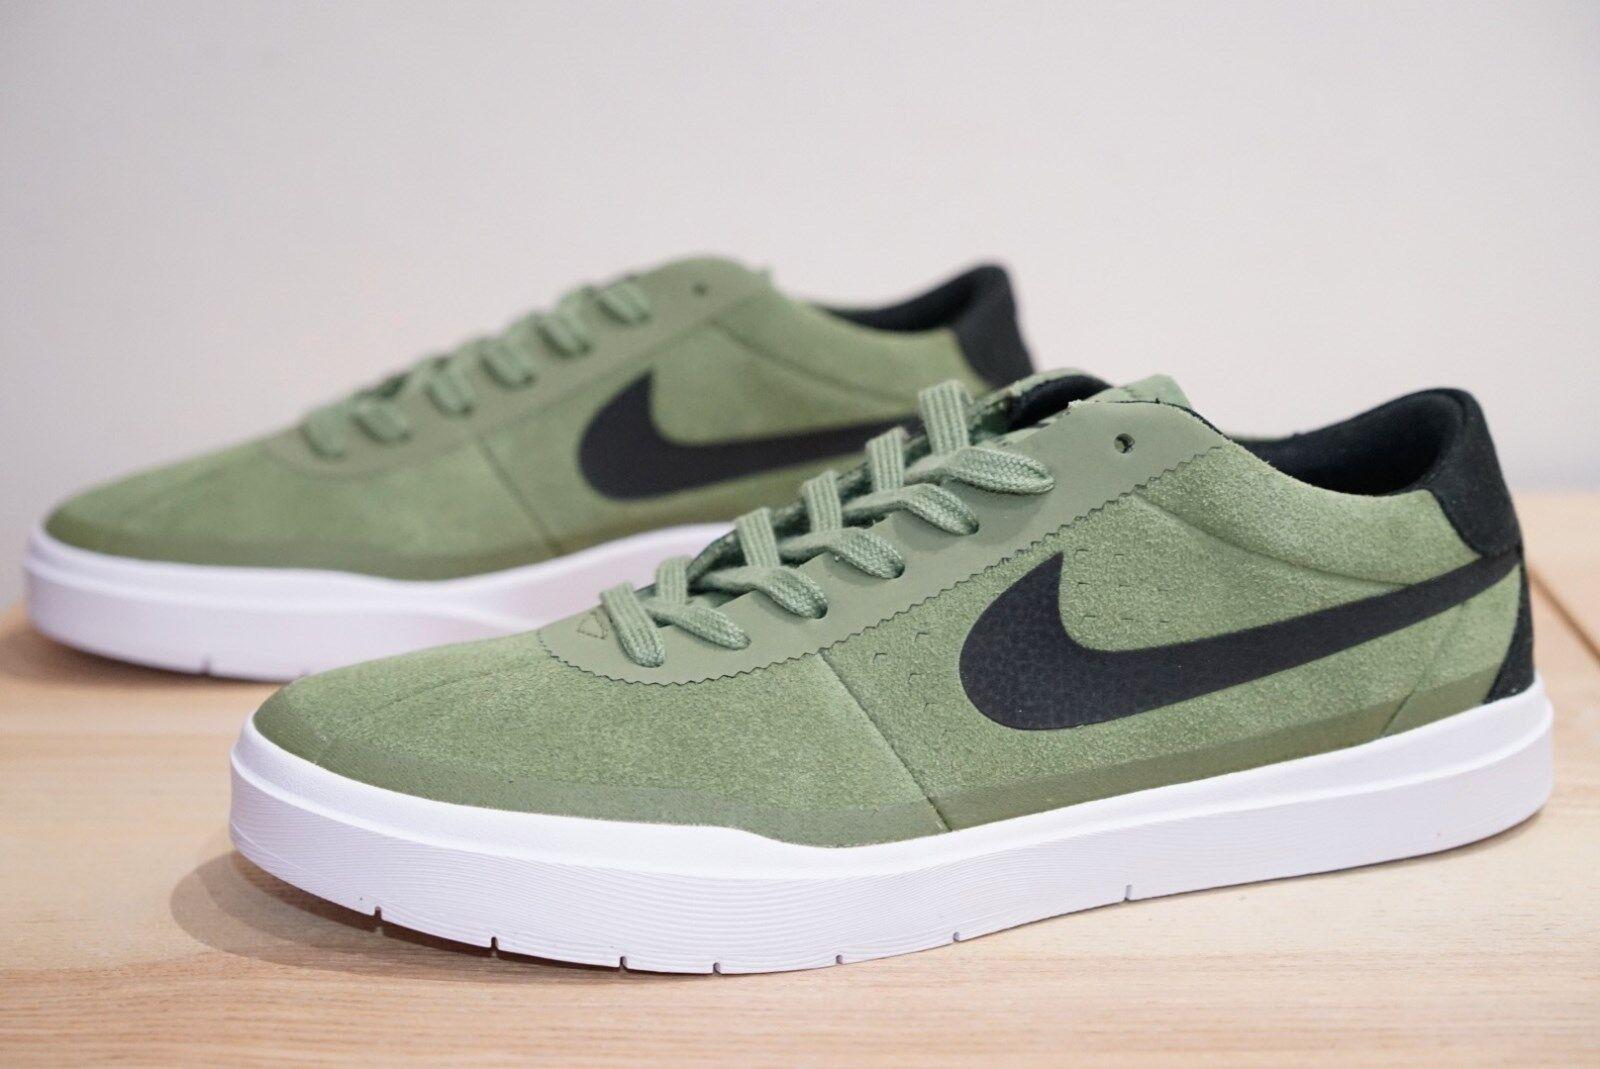 Nike SB Bruin Hyperfeel Da Uomo Scarpe Da Ginnastica Da Skate Board Scarpe Misura PALM VERDE OBM